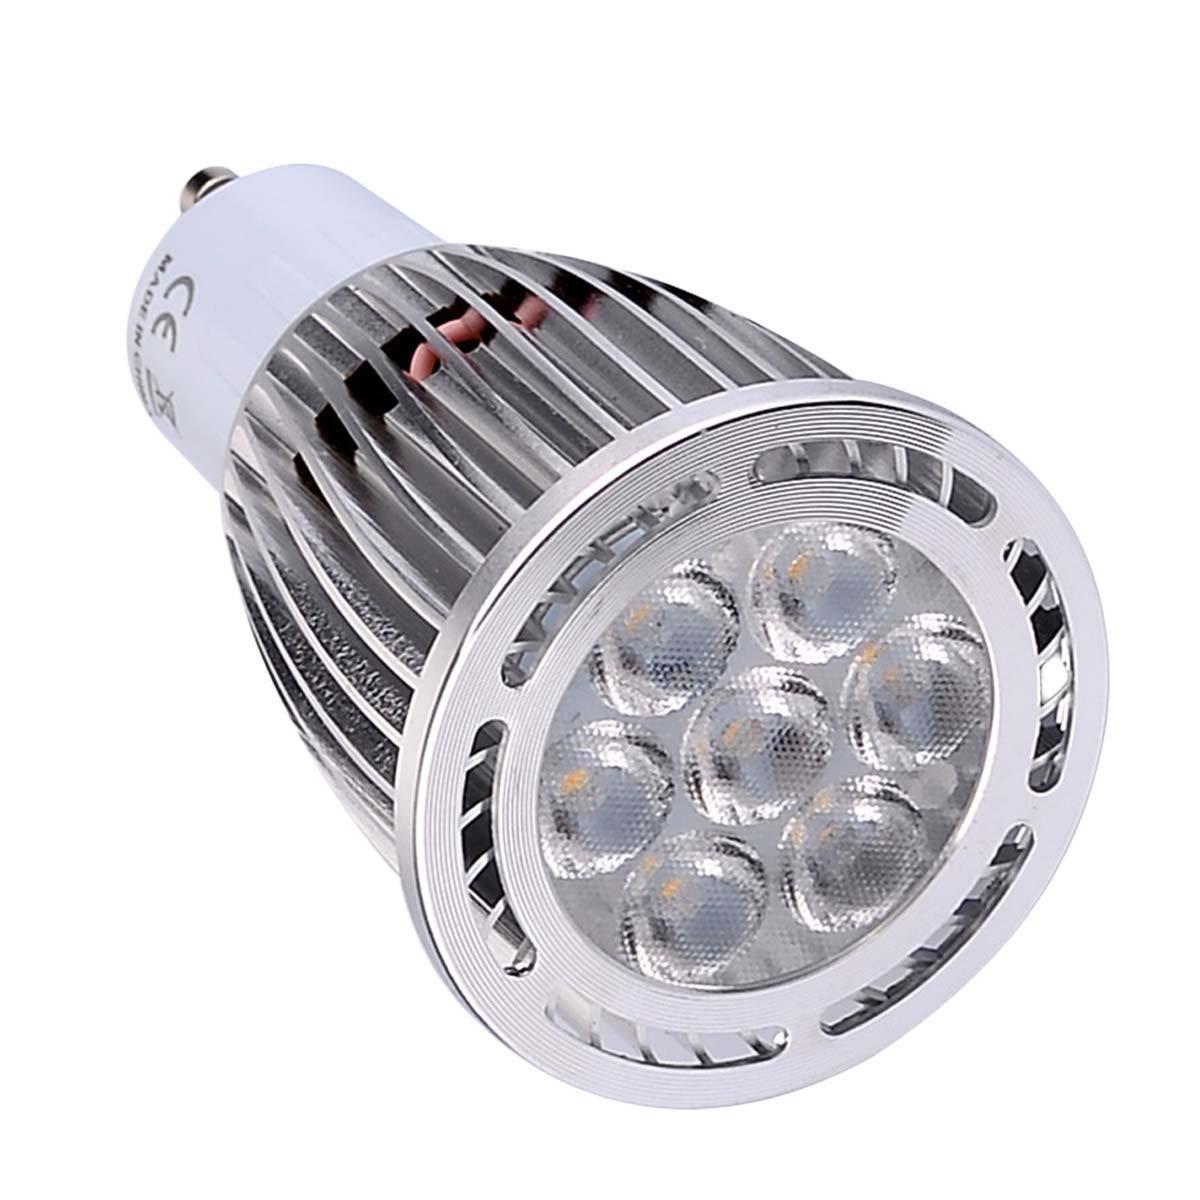 GU10 7W SMD 3030 600-700 LM Warm White/Cool White Frosted LED Spotlight AC 85-265V AC 220-240V AC 110-130V (1Pcs) (Color : AC 85-265V-Cold White)